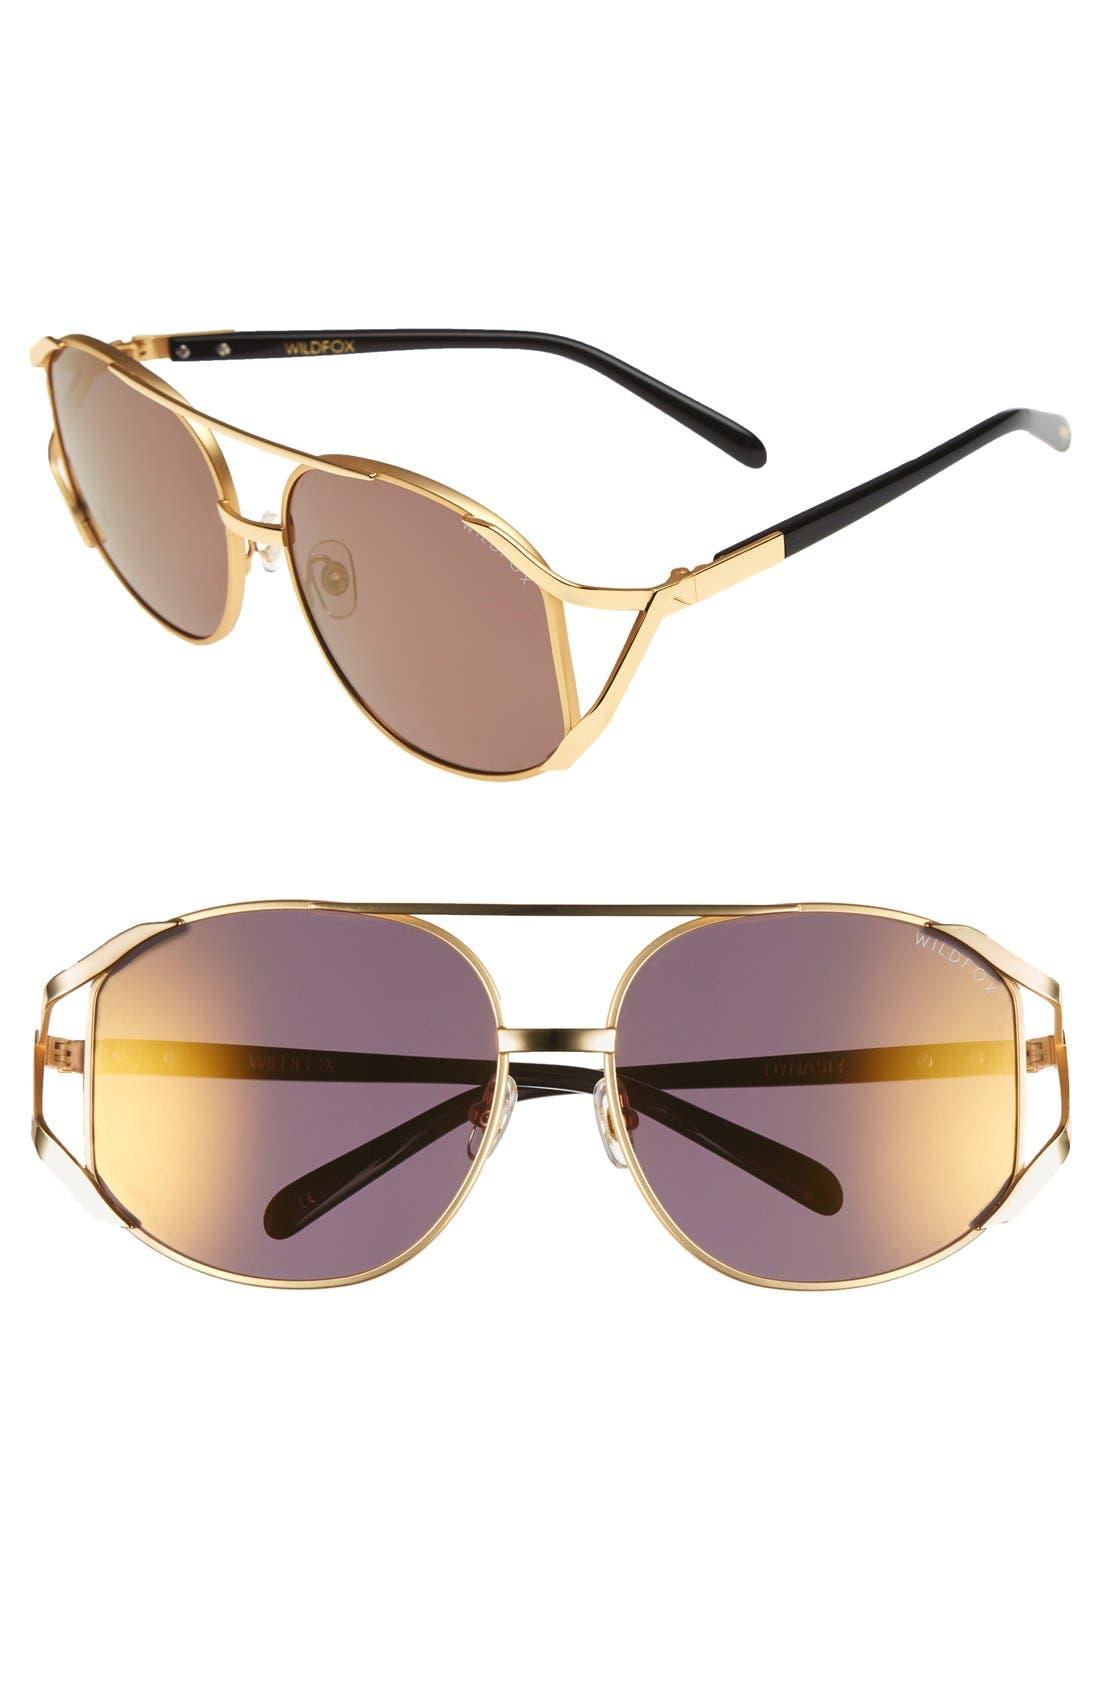 'Dynasty Deluxe' 59mm Retro Sunglasses,                         Main,                         color, Gold Tortoise/ Gold Mirror